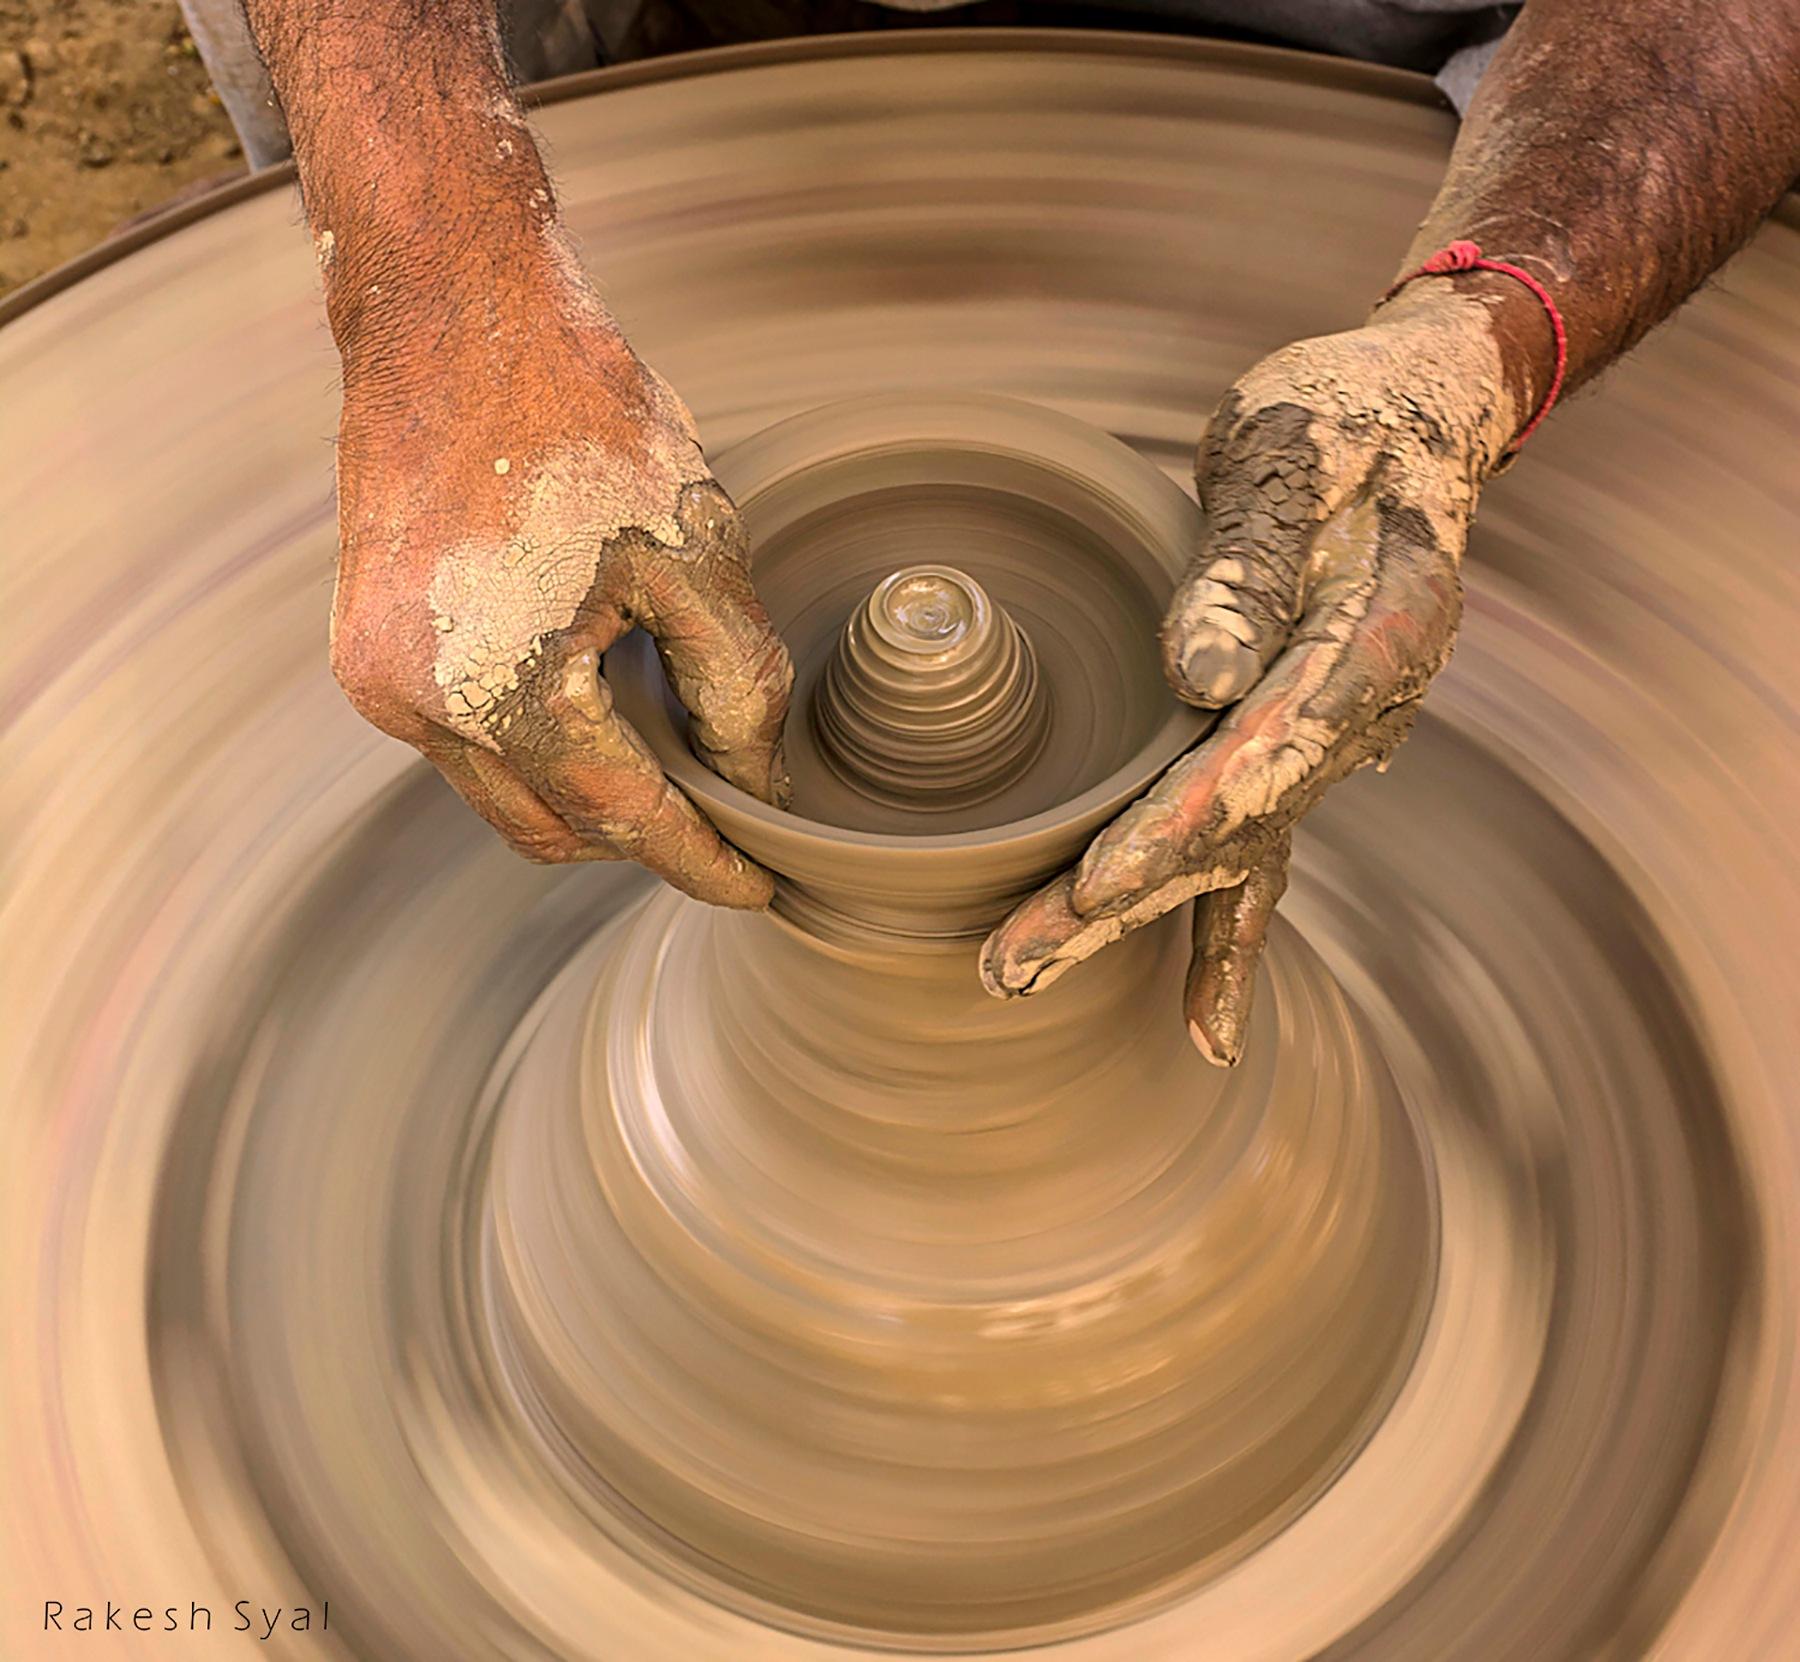 MOULDING HANDS by Rakesh Syal